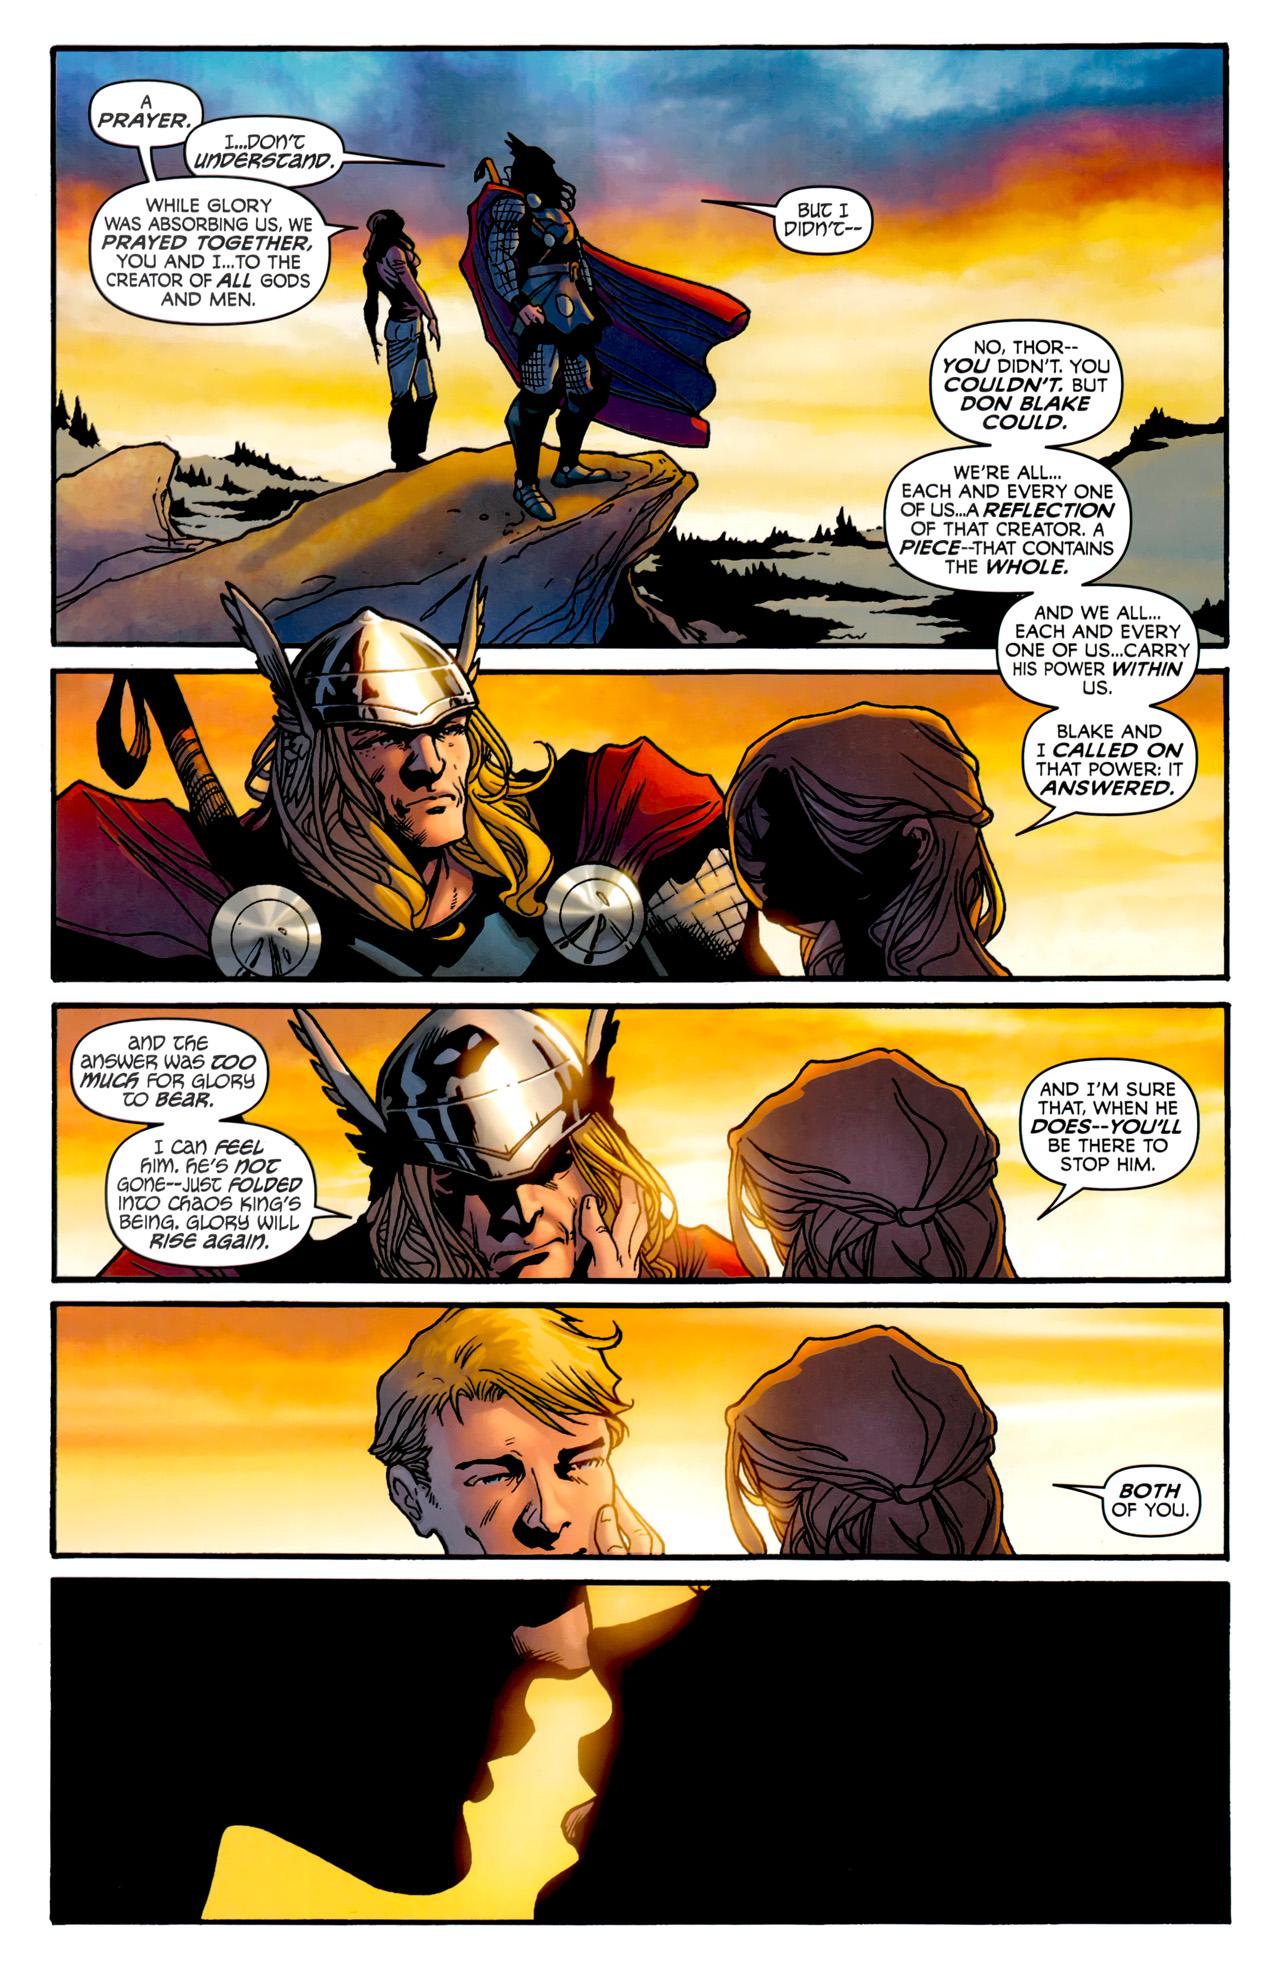 Image - Chaos War Thor